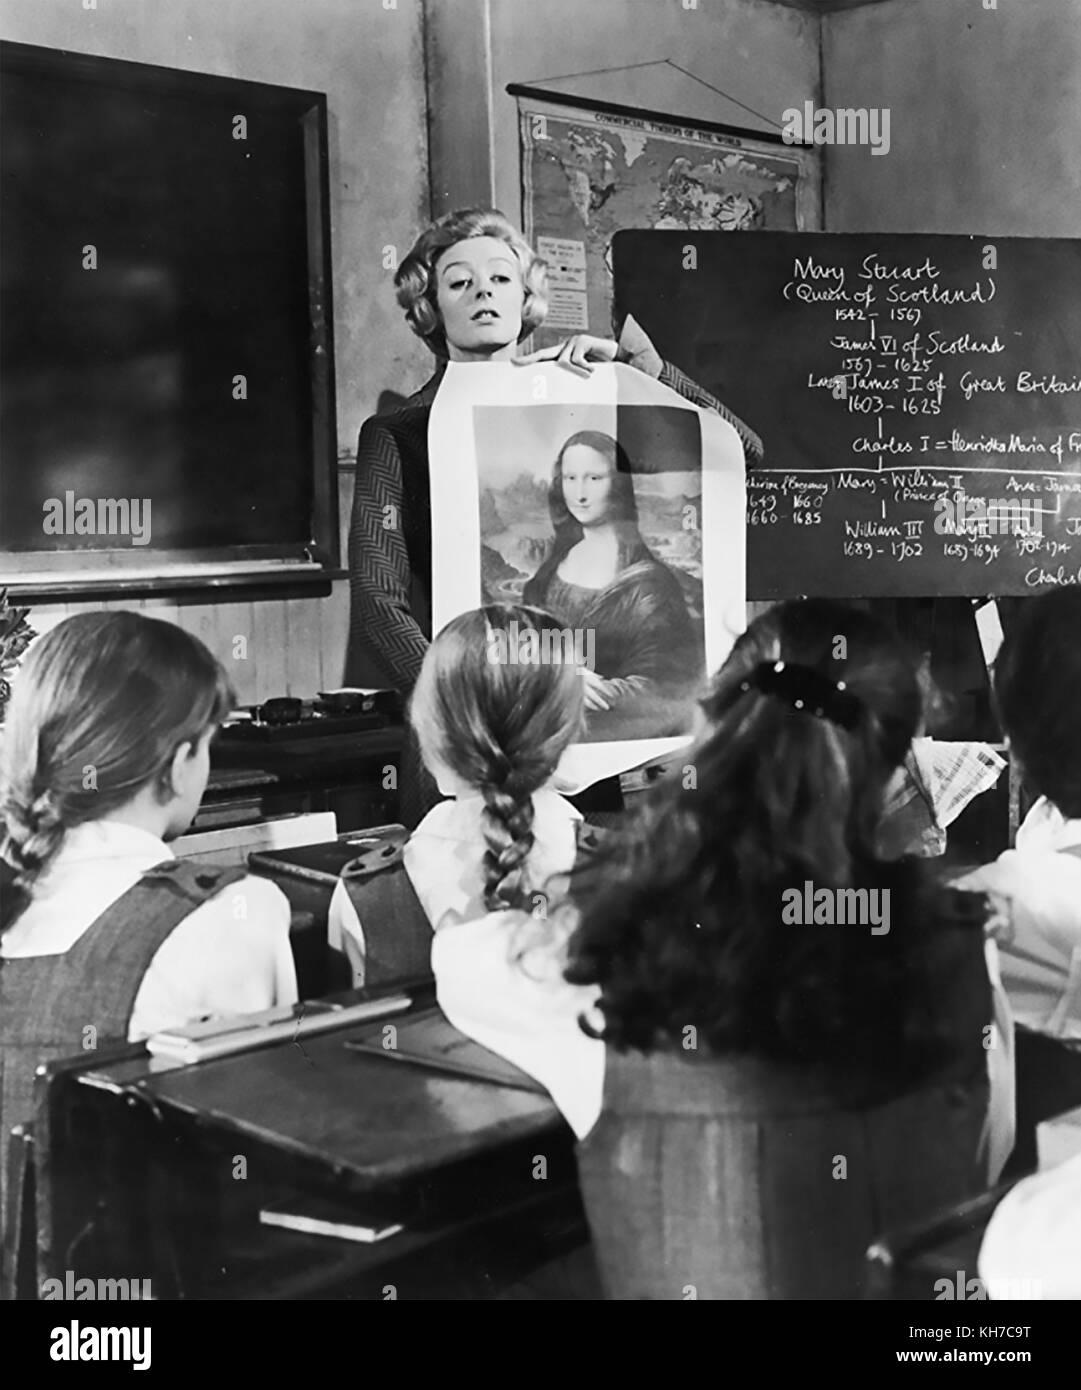 THE PRIME OF MISS JEAN BRODIE 1969 Twentieth Century Fox film with Maggie Smith - Stock Image